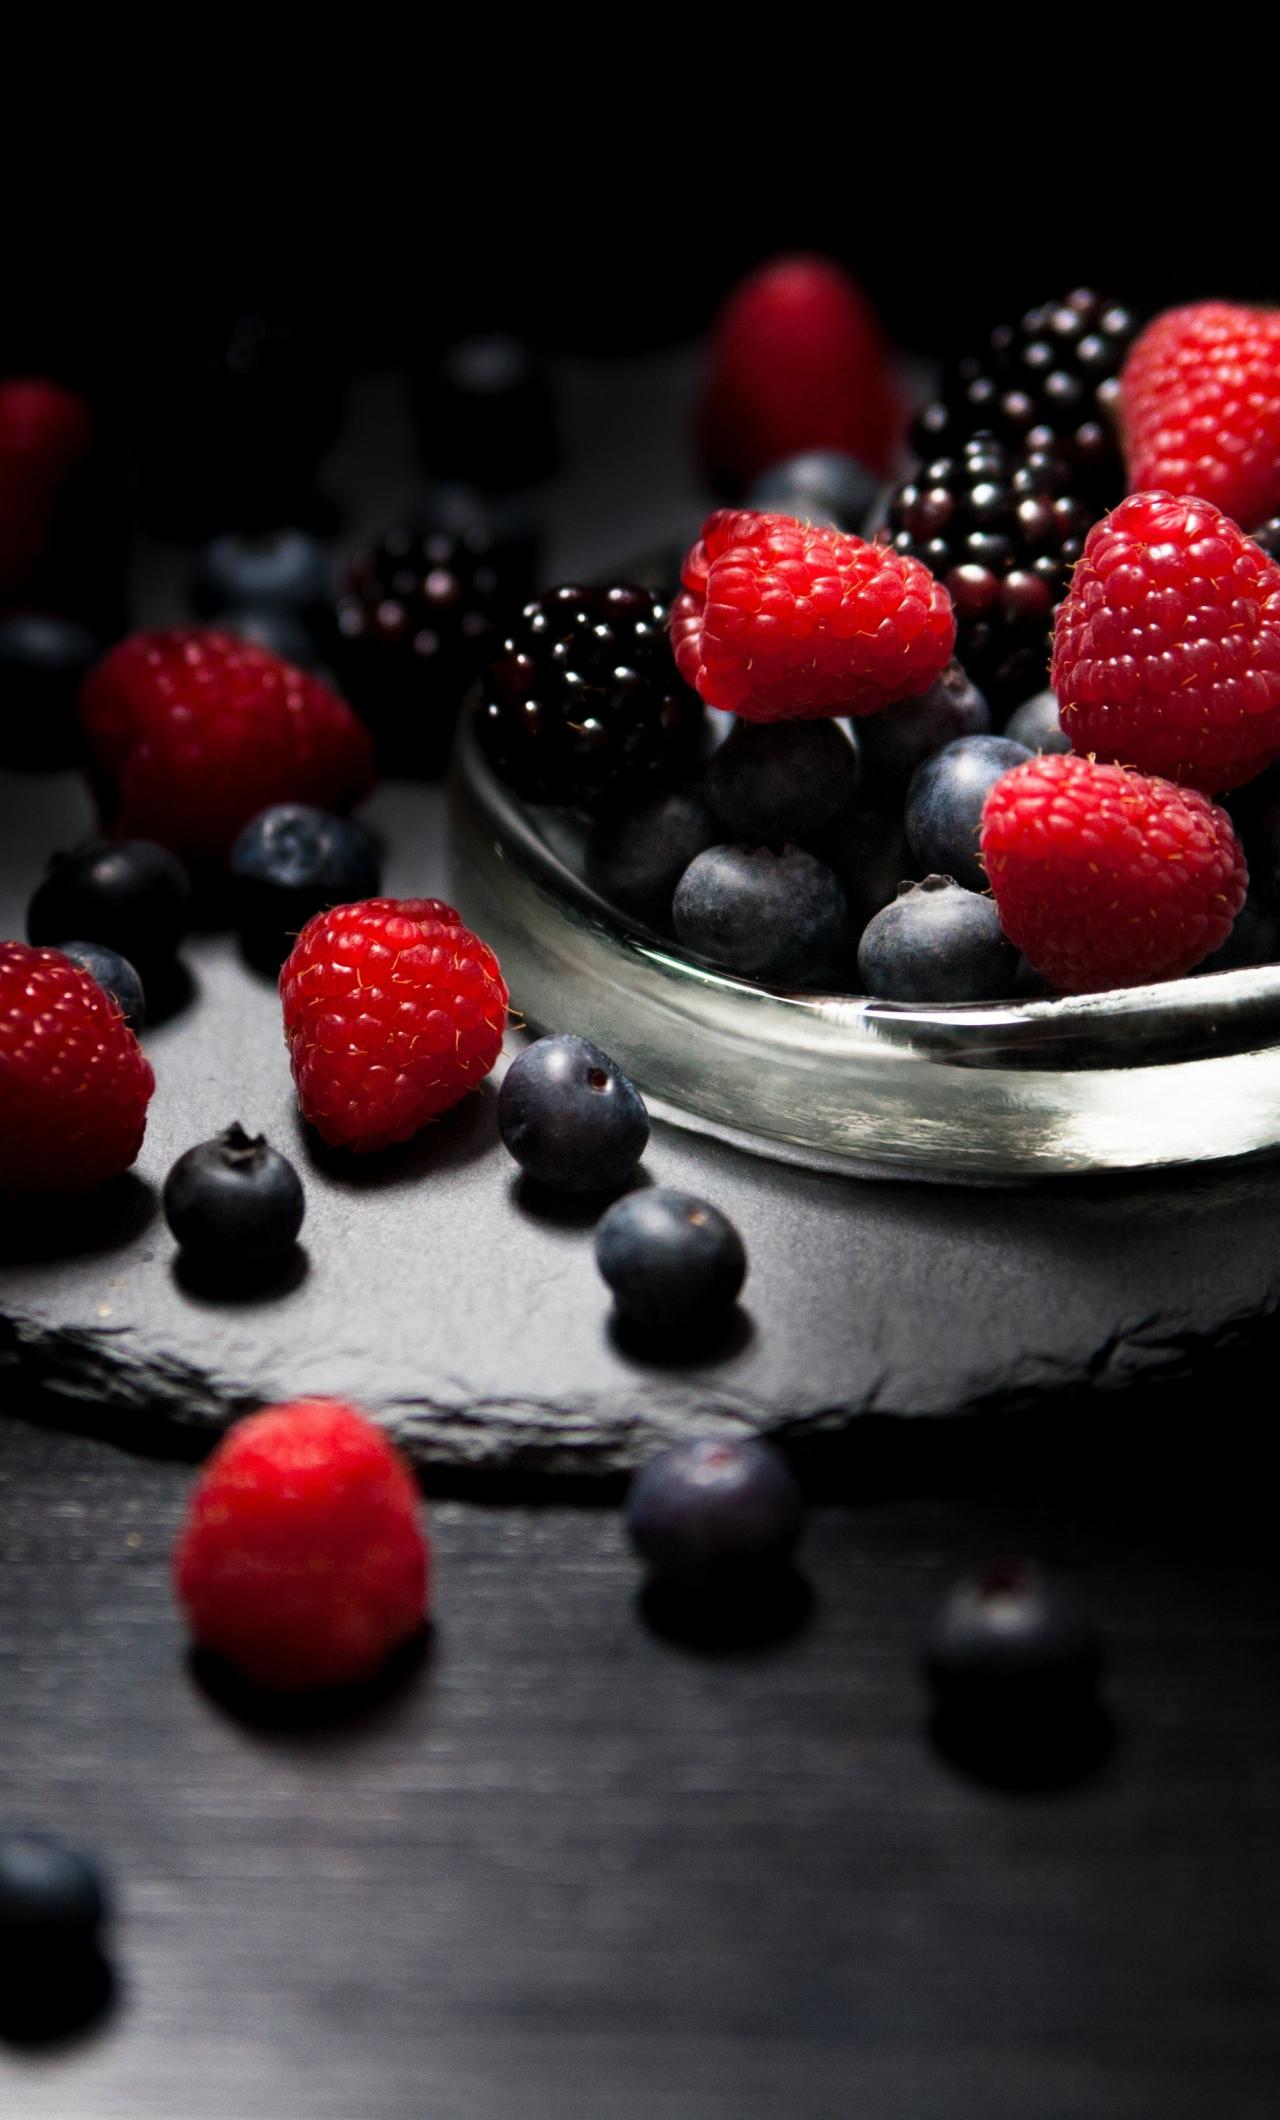 Dark mood food raspberry blackberry